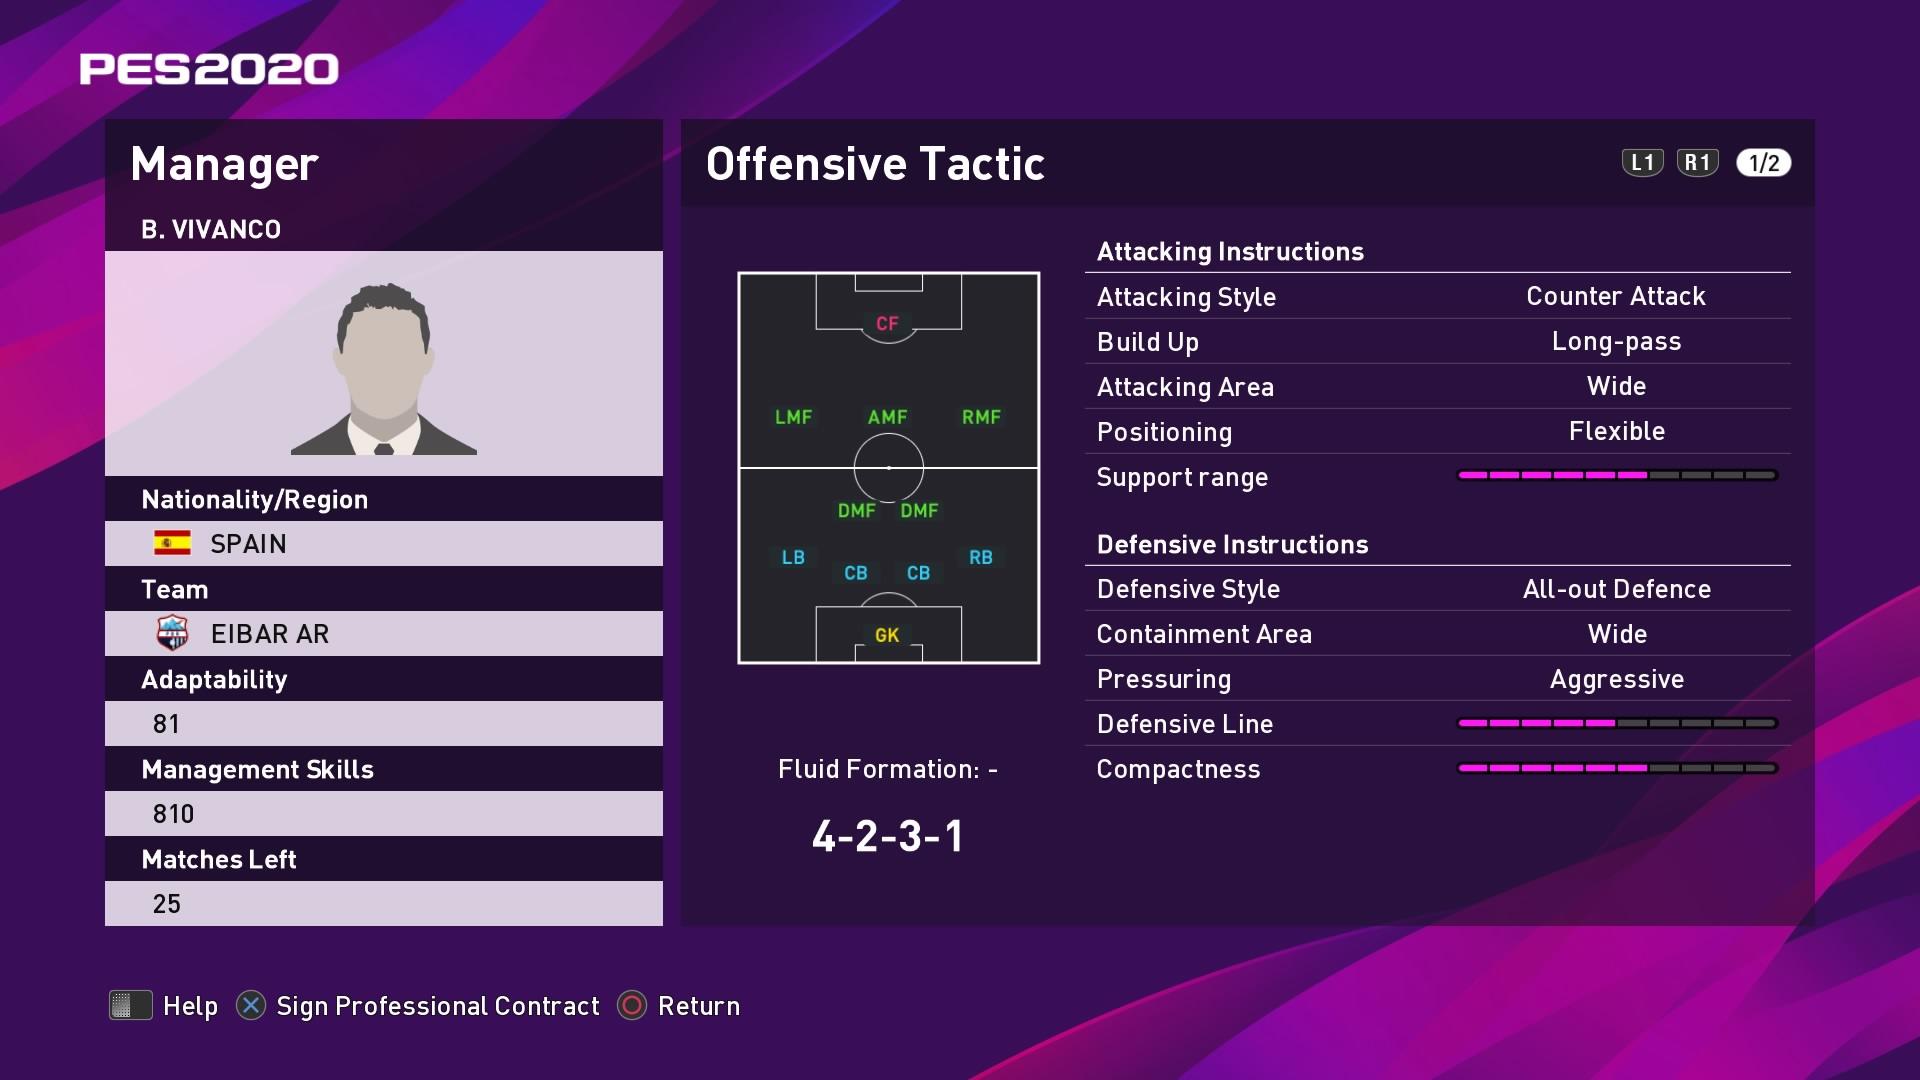 B. Vivanco (2) (José Luis Mendilibar) Offensive Tactic in PES 2020 myClub